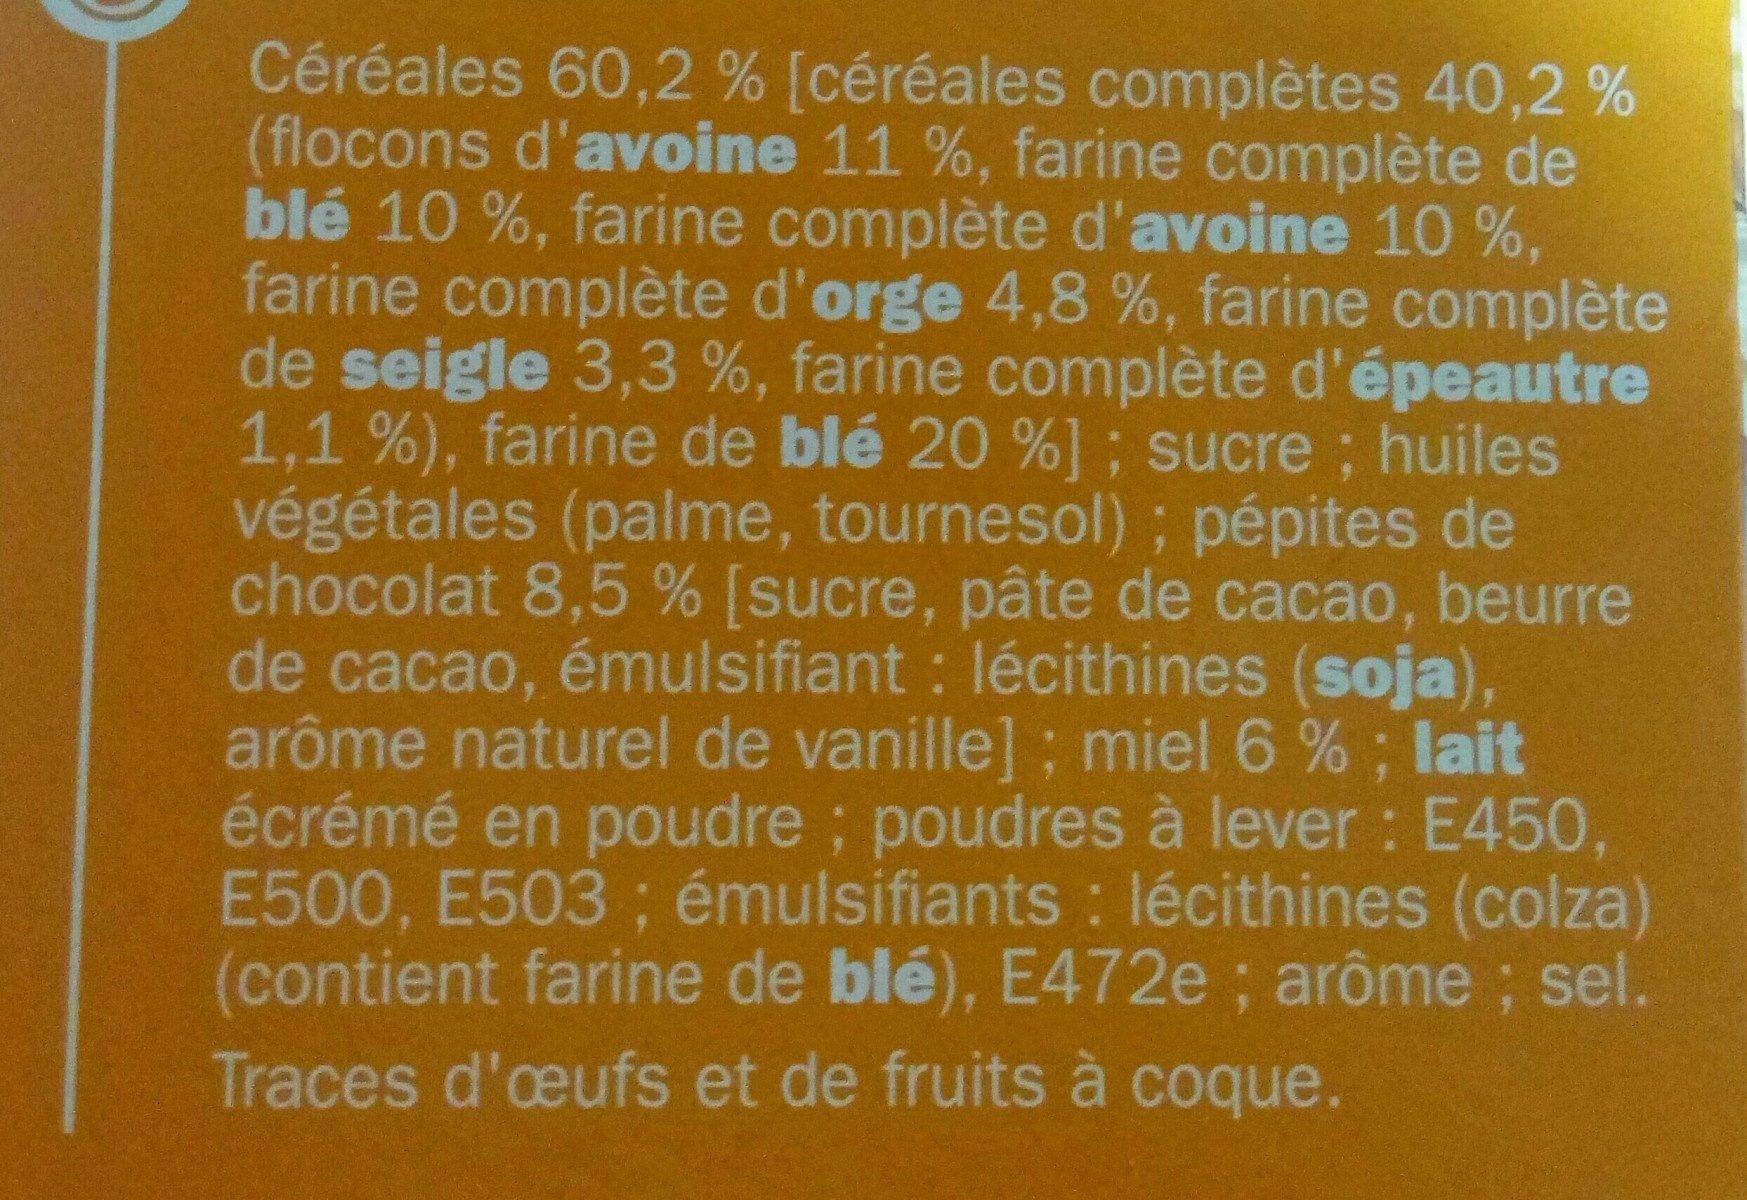 Biscuits petit déjeuner Déli-Matin miel et pépites de chocolat - Ingrediënten